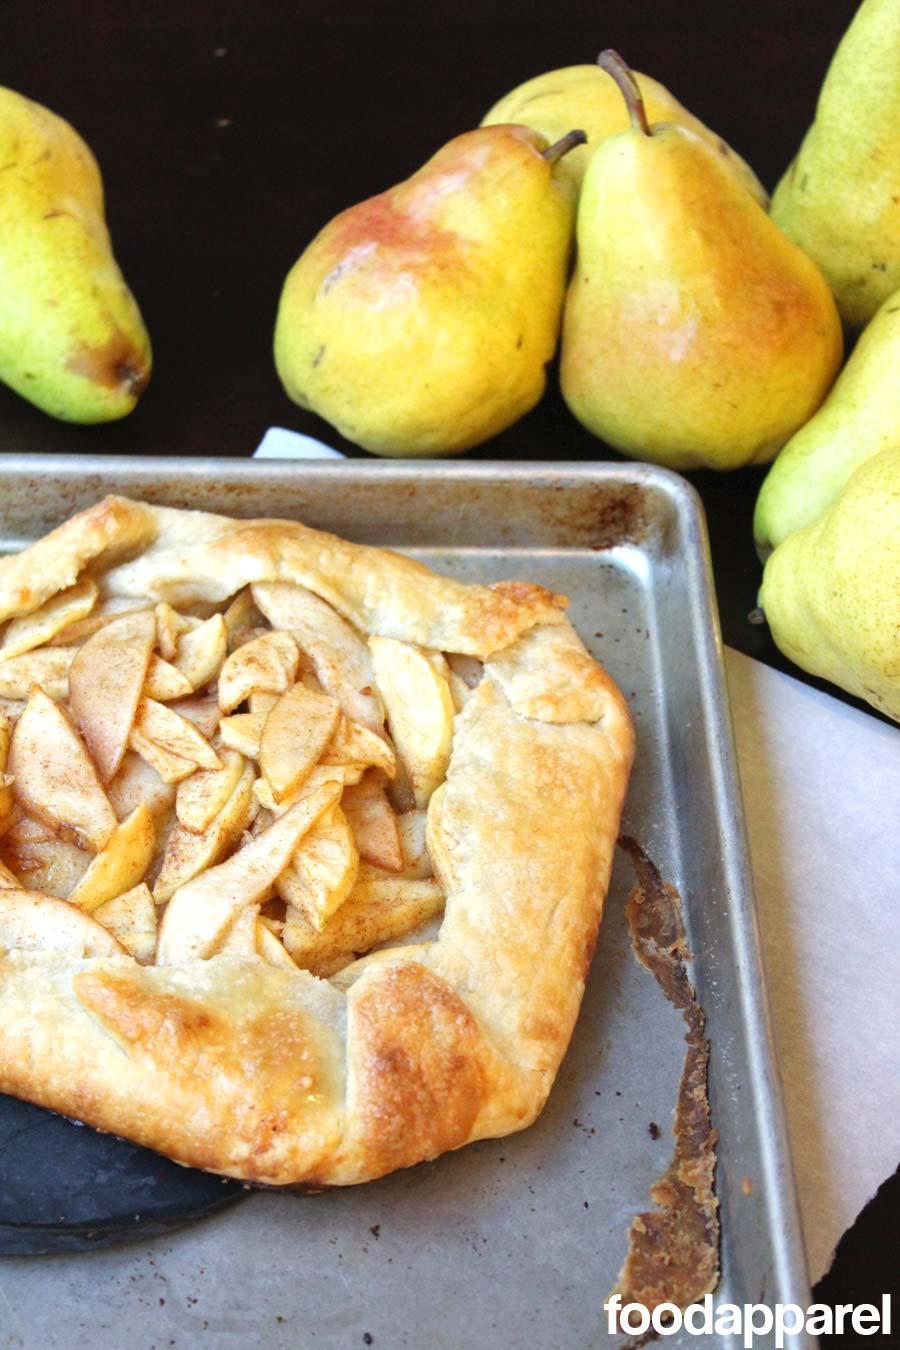 Apple Pear Galette Recipe (Rustic Pie)   Food Apparel